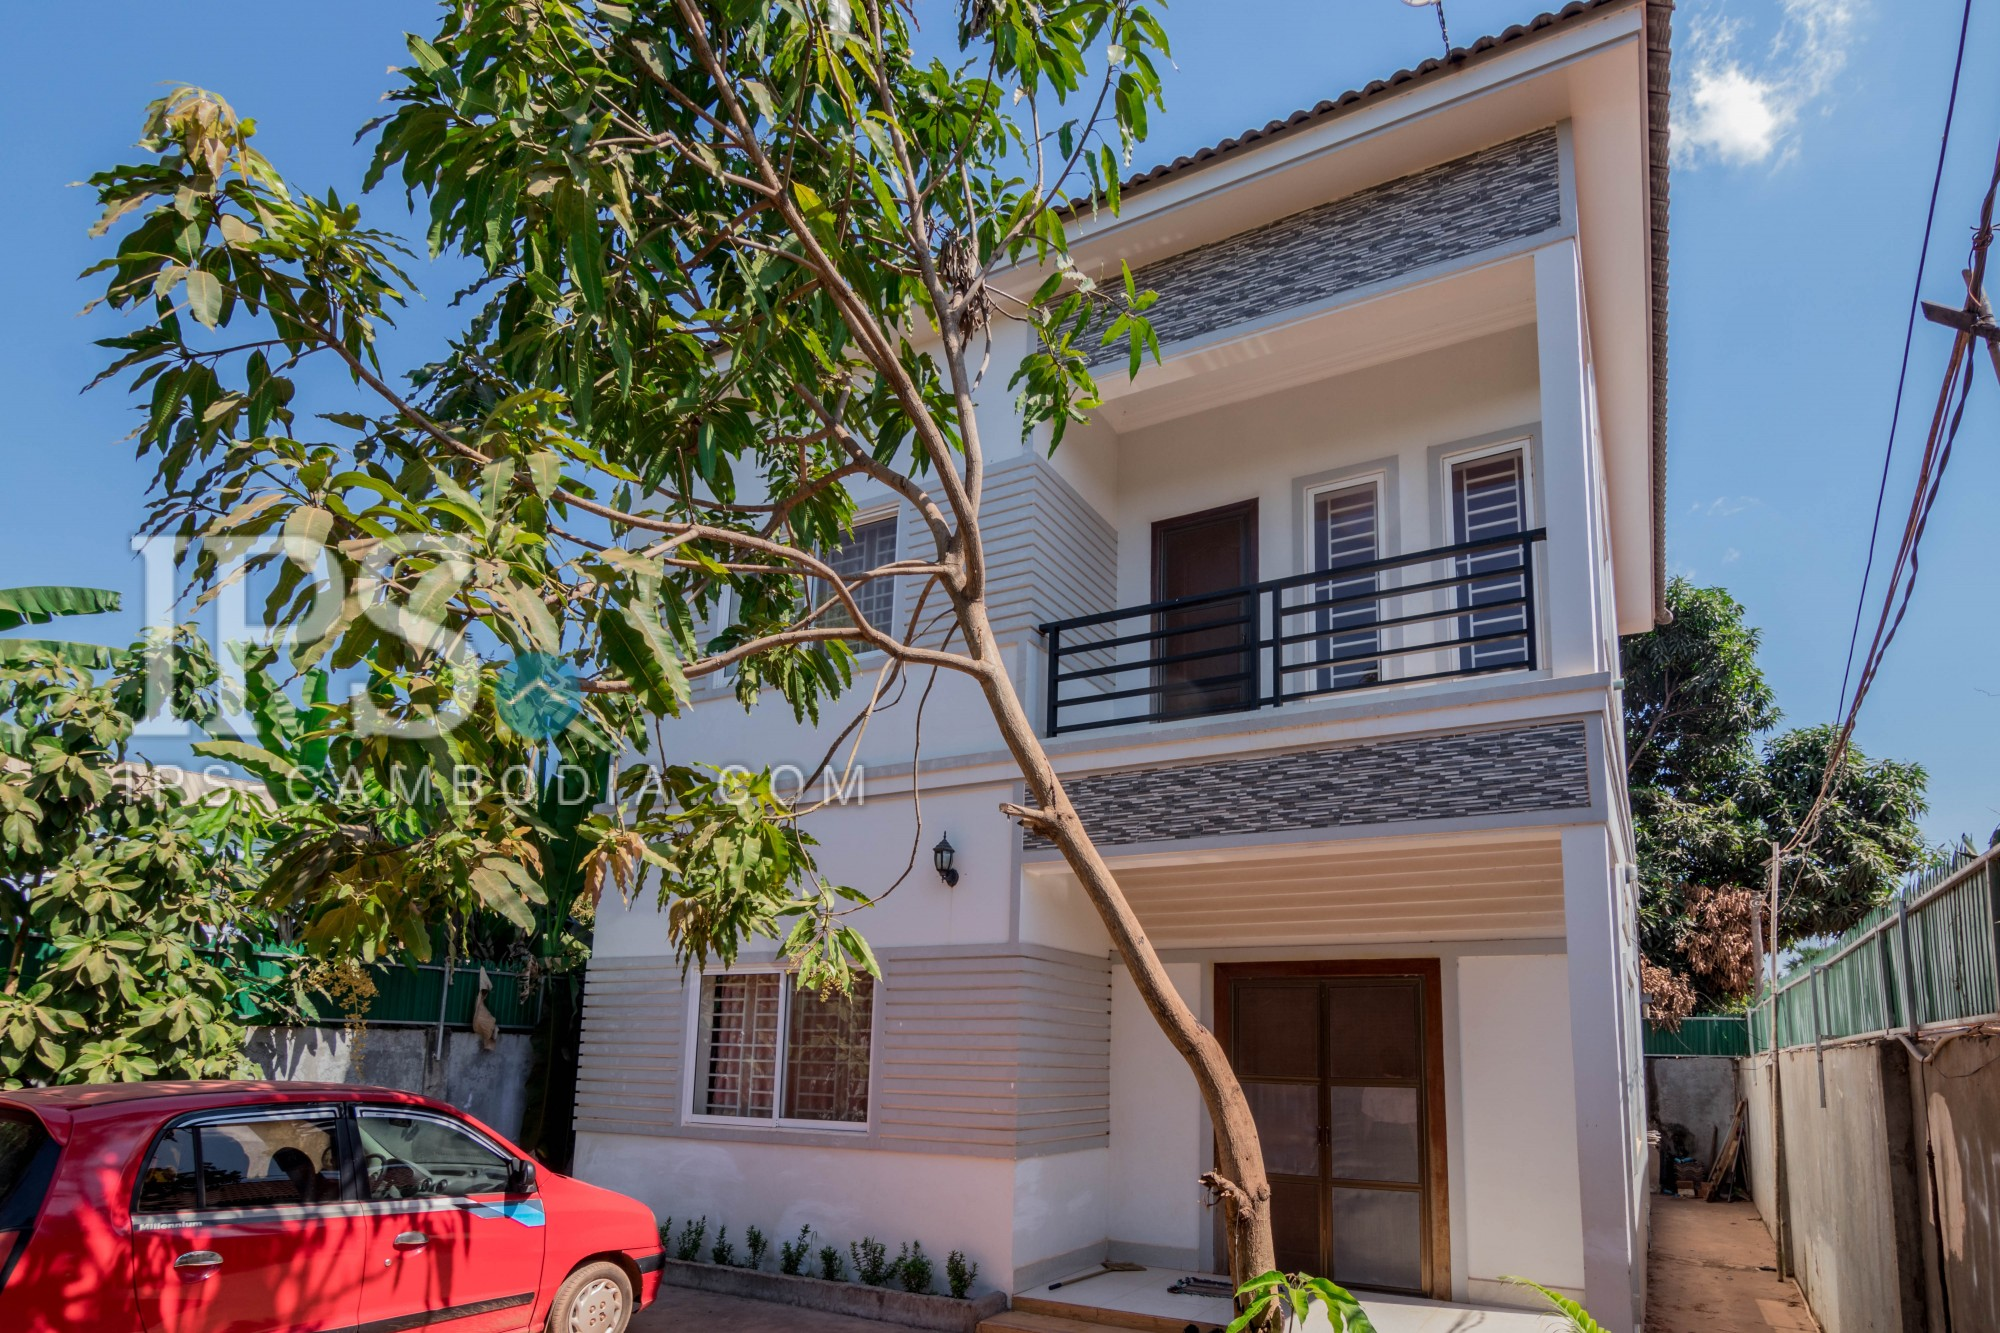 3 Bedroom House For Rent - Sala Kamreuk, Siem Reap